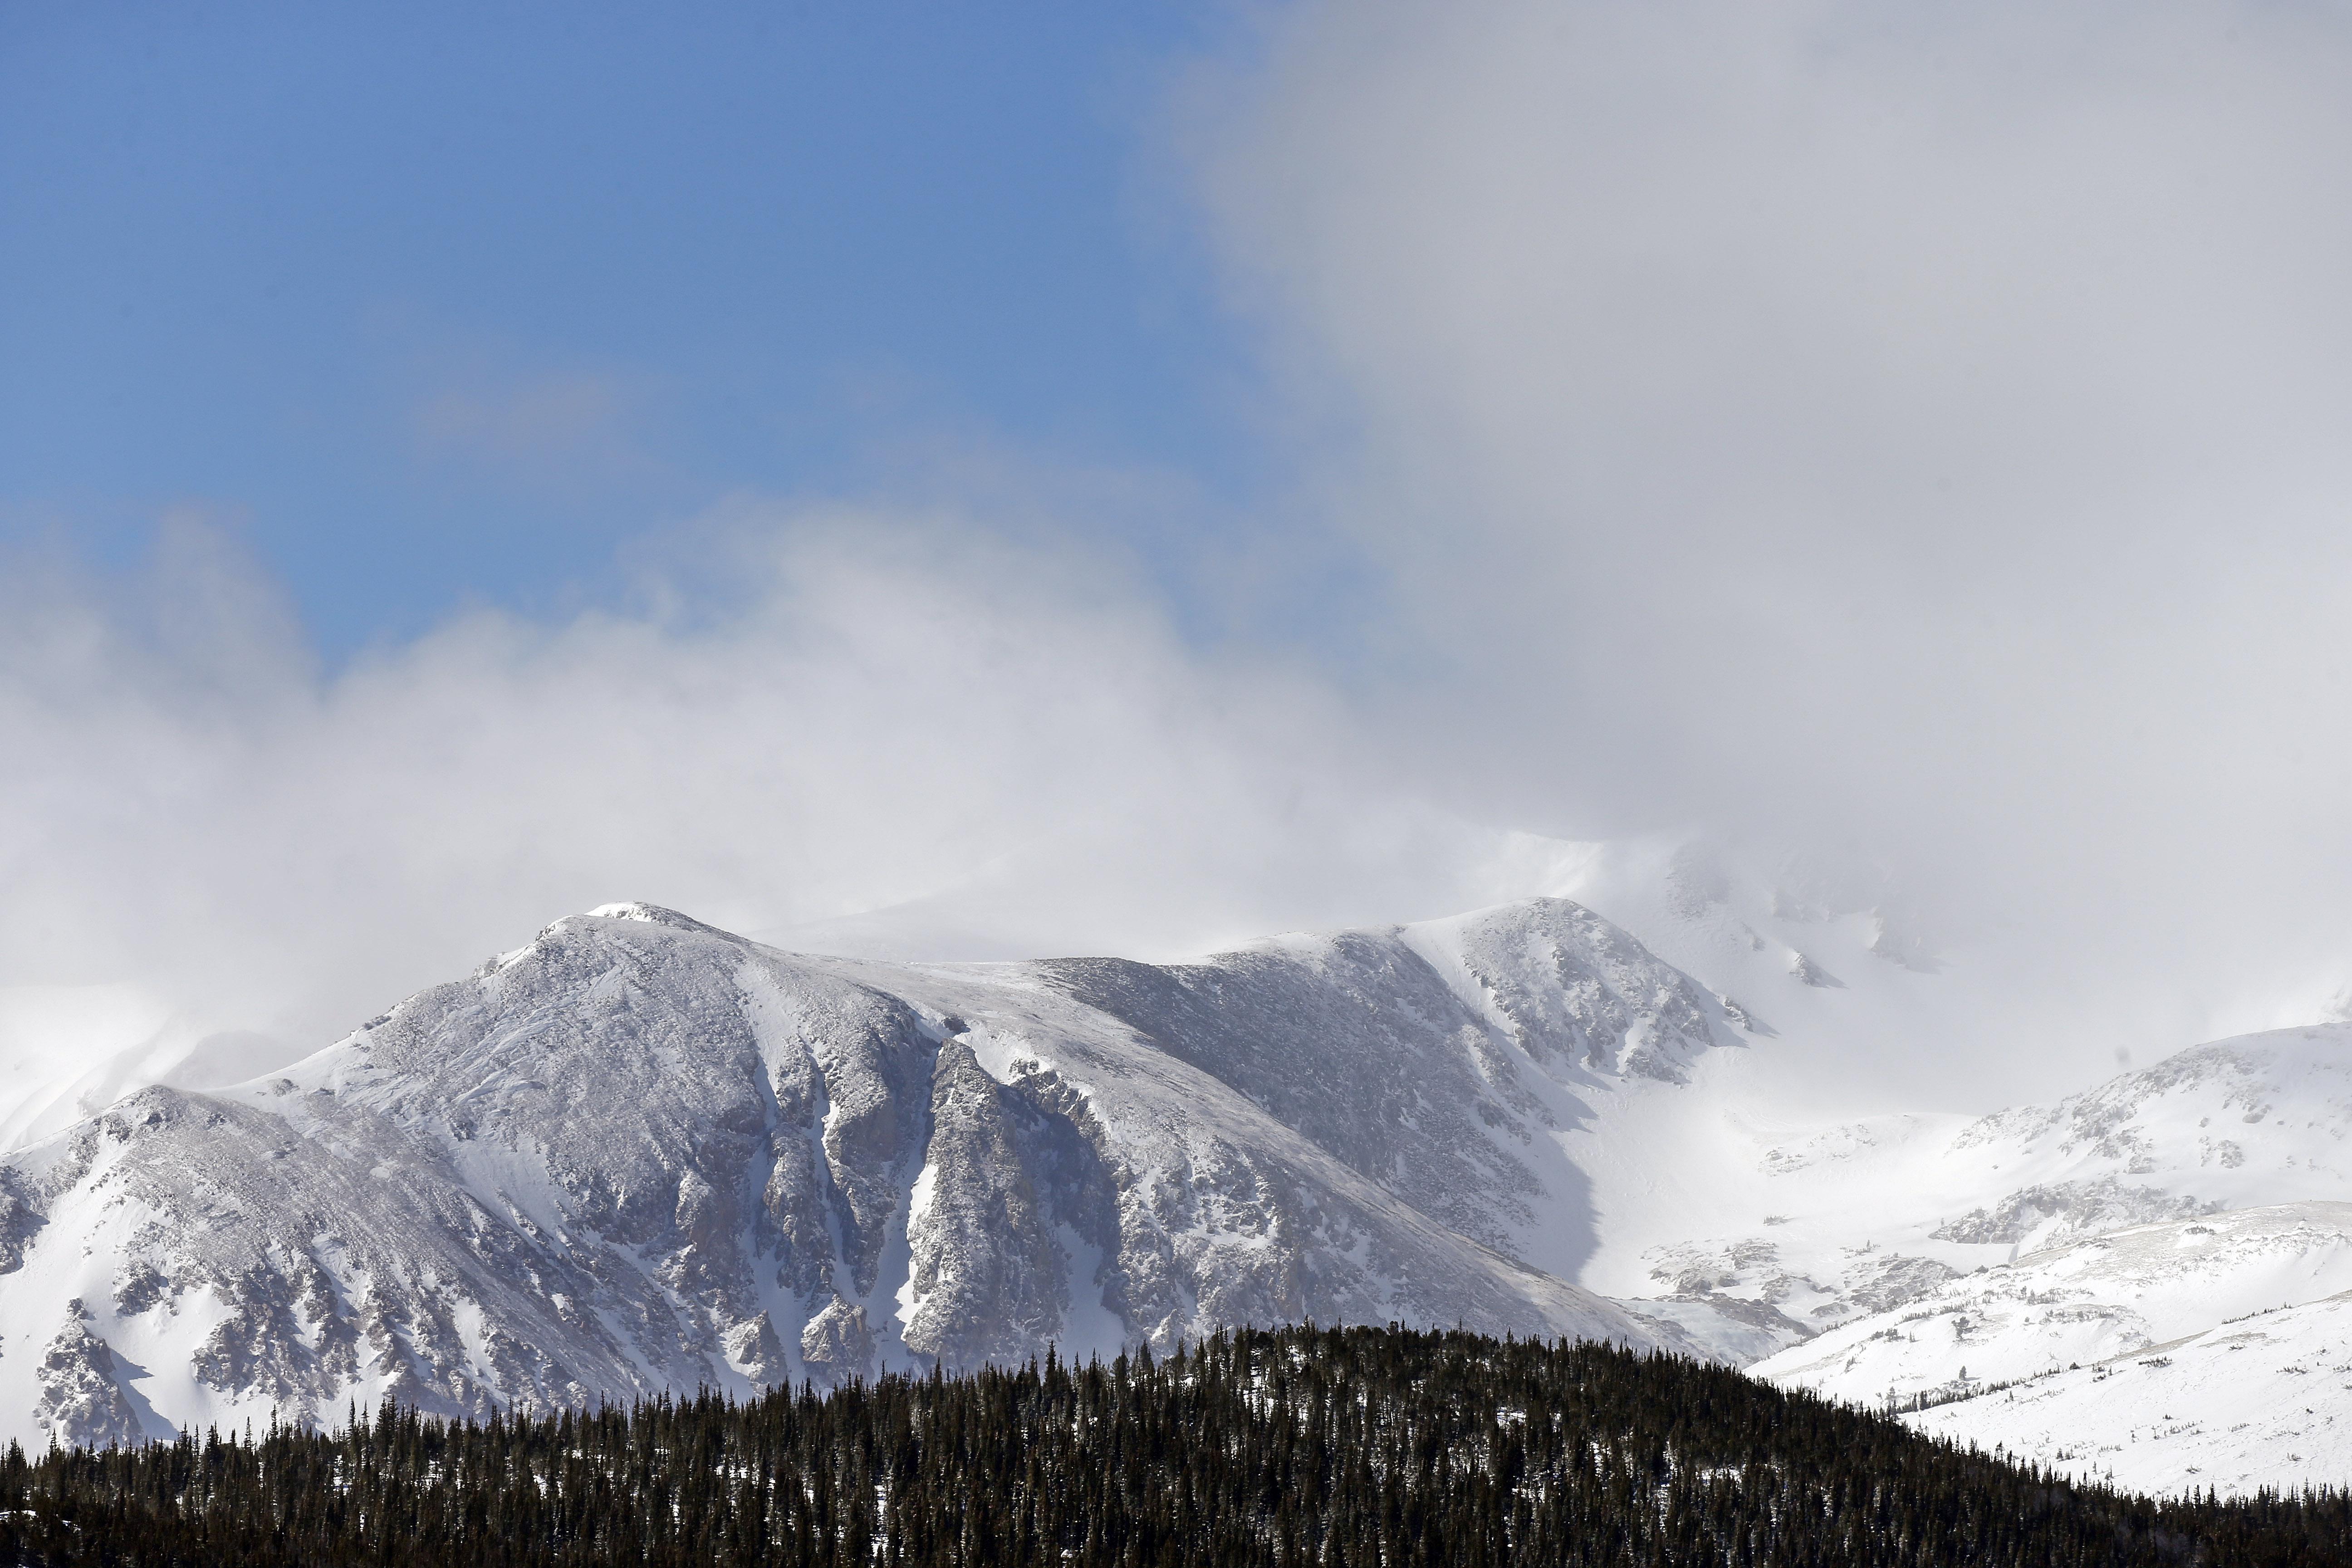 Photo: Indian Peaks Wilderness (AP Photo)